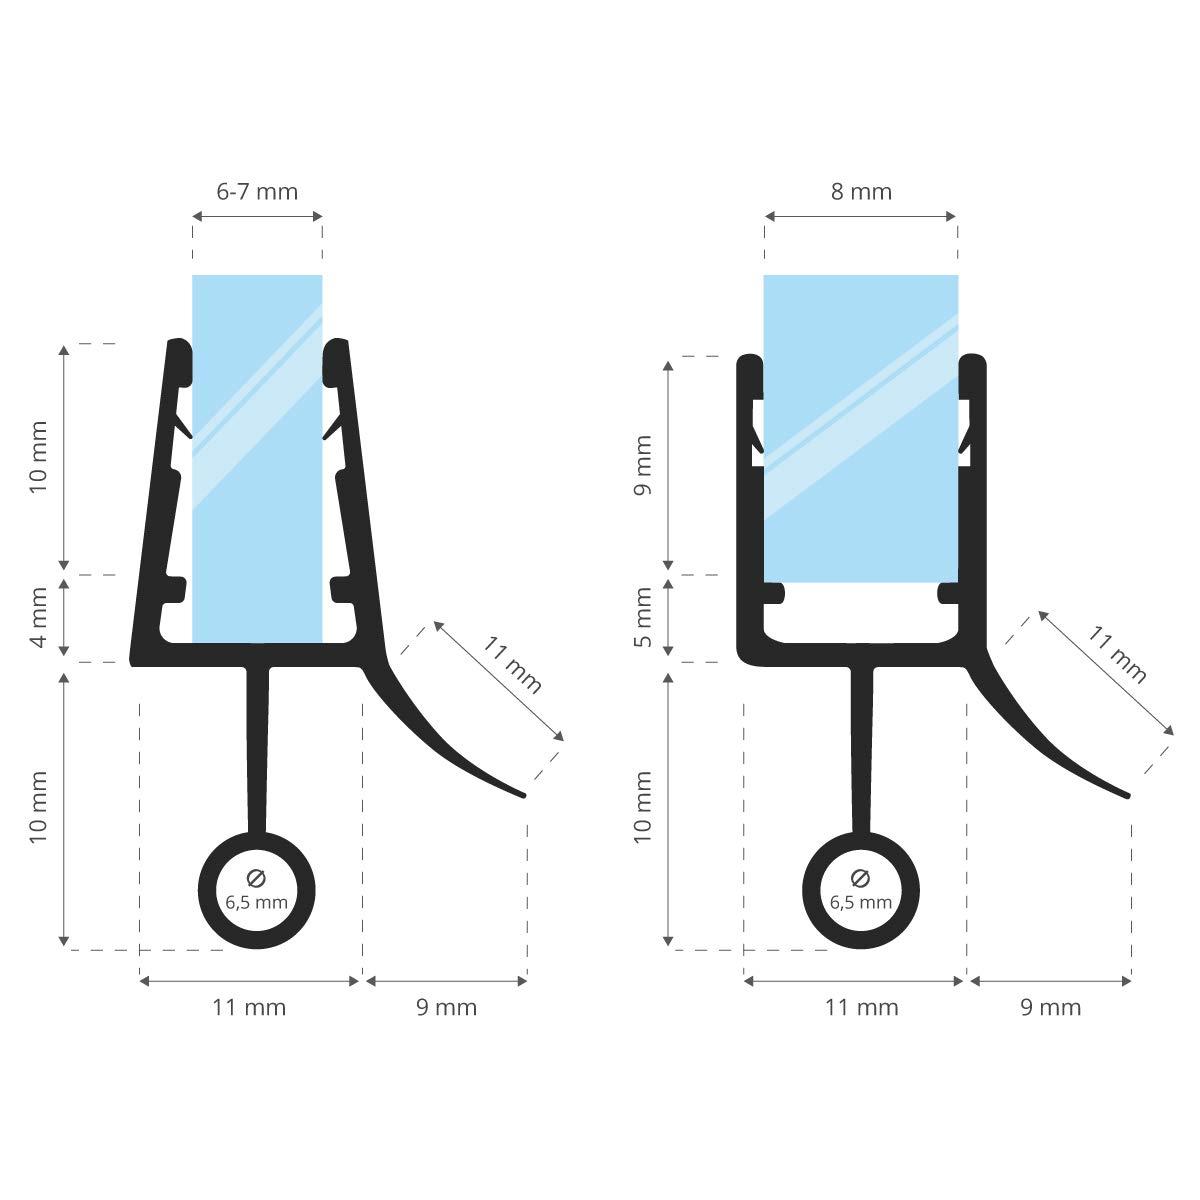 STEIGNER Junta de Ducha Curvada 40 cm UK08 Ducha Redonda Cabina de Ducha Semicircular Junta Semicircular Para las Mamparas de 6 mm// 7 mm// 8 mm Junta de Repuesto Semicircular